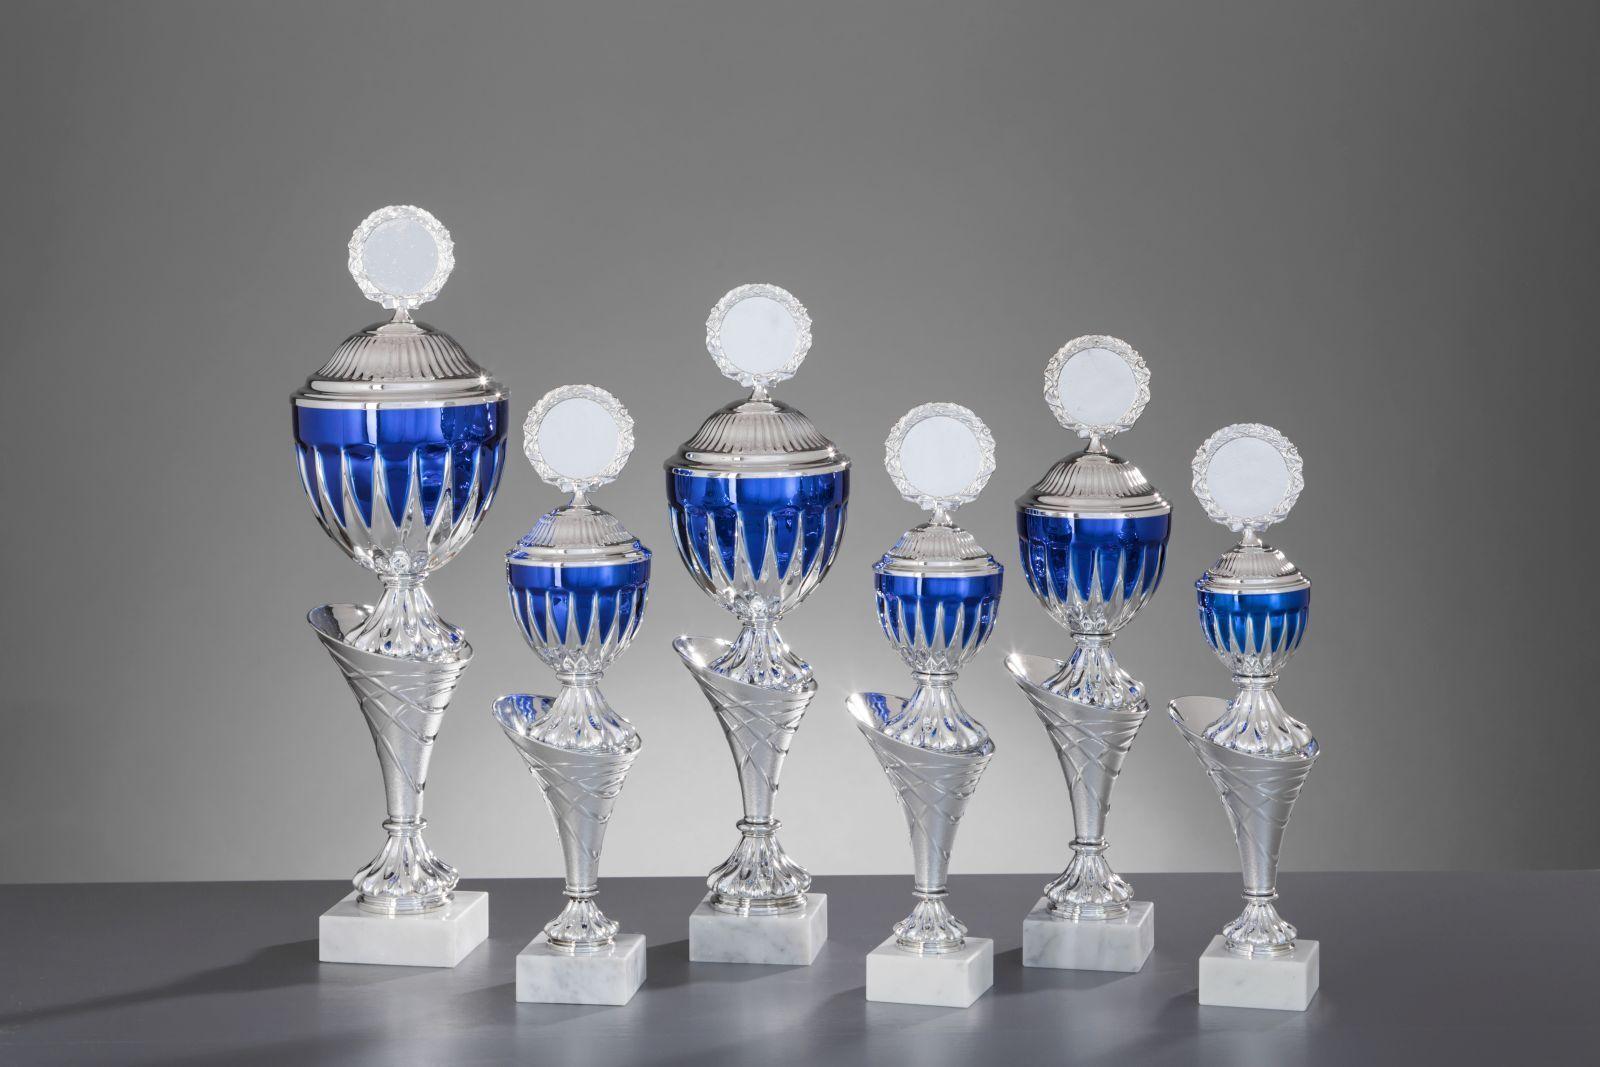 Pokale 6er Serie Jaqueline silber silber silber blau 35,4cm - 48,3cm ff5f99